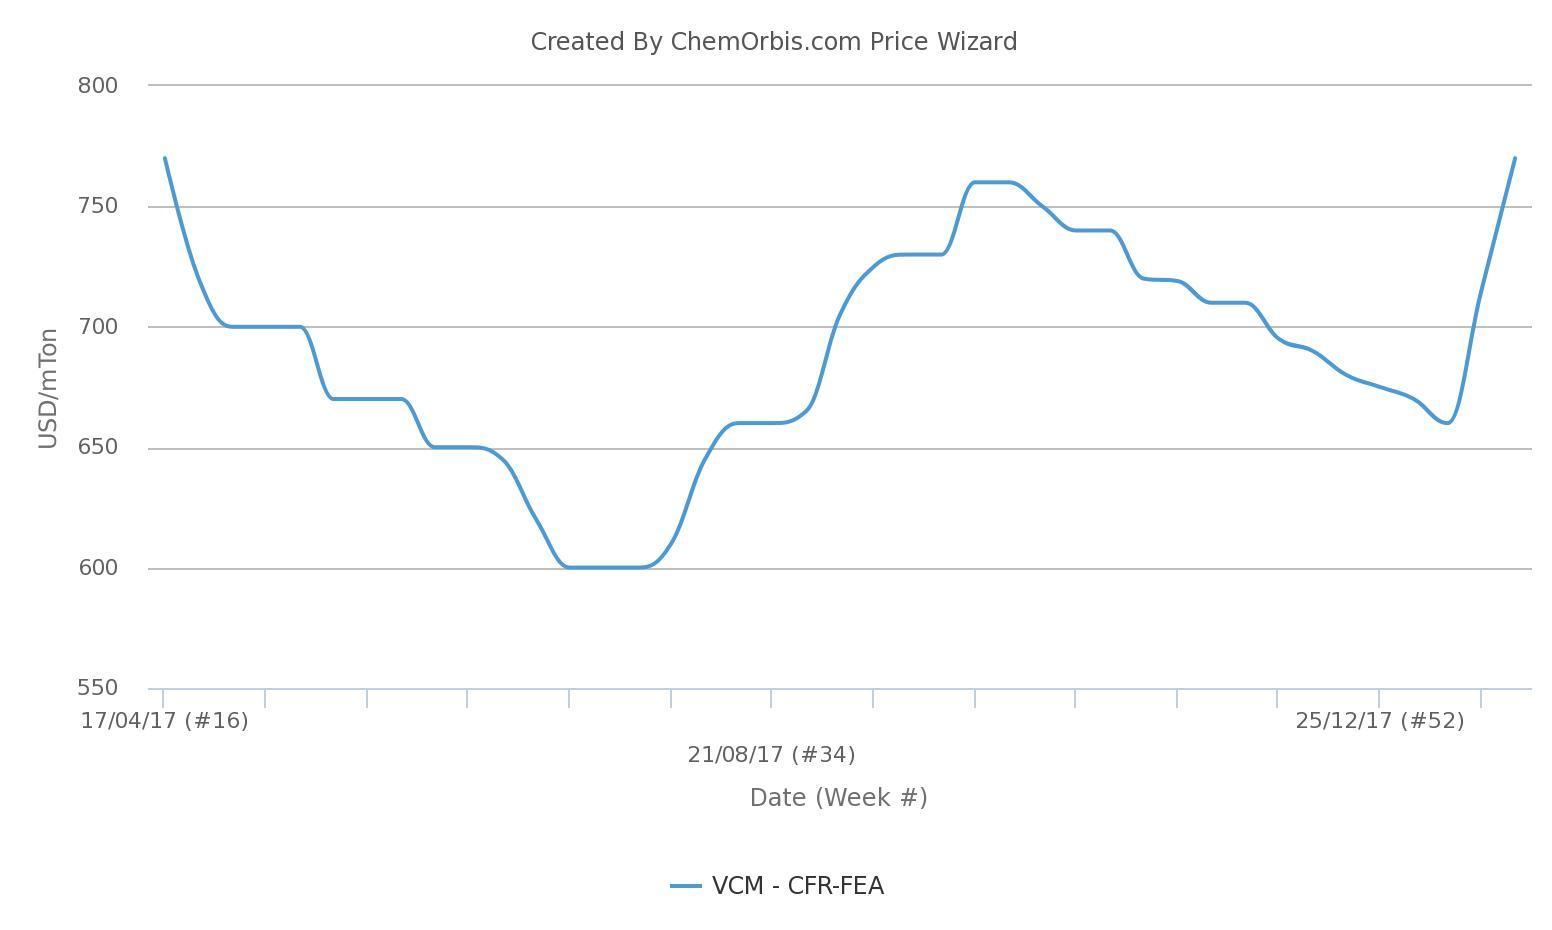 VCM shutdowns add to firming in Asian PVC markets - ChemOrbis com